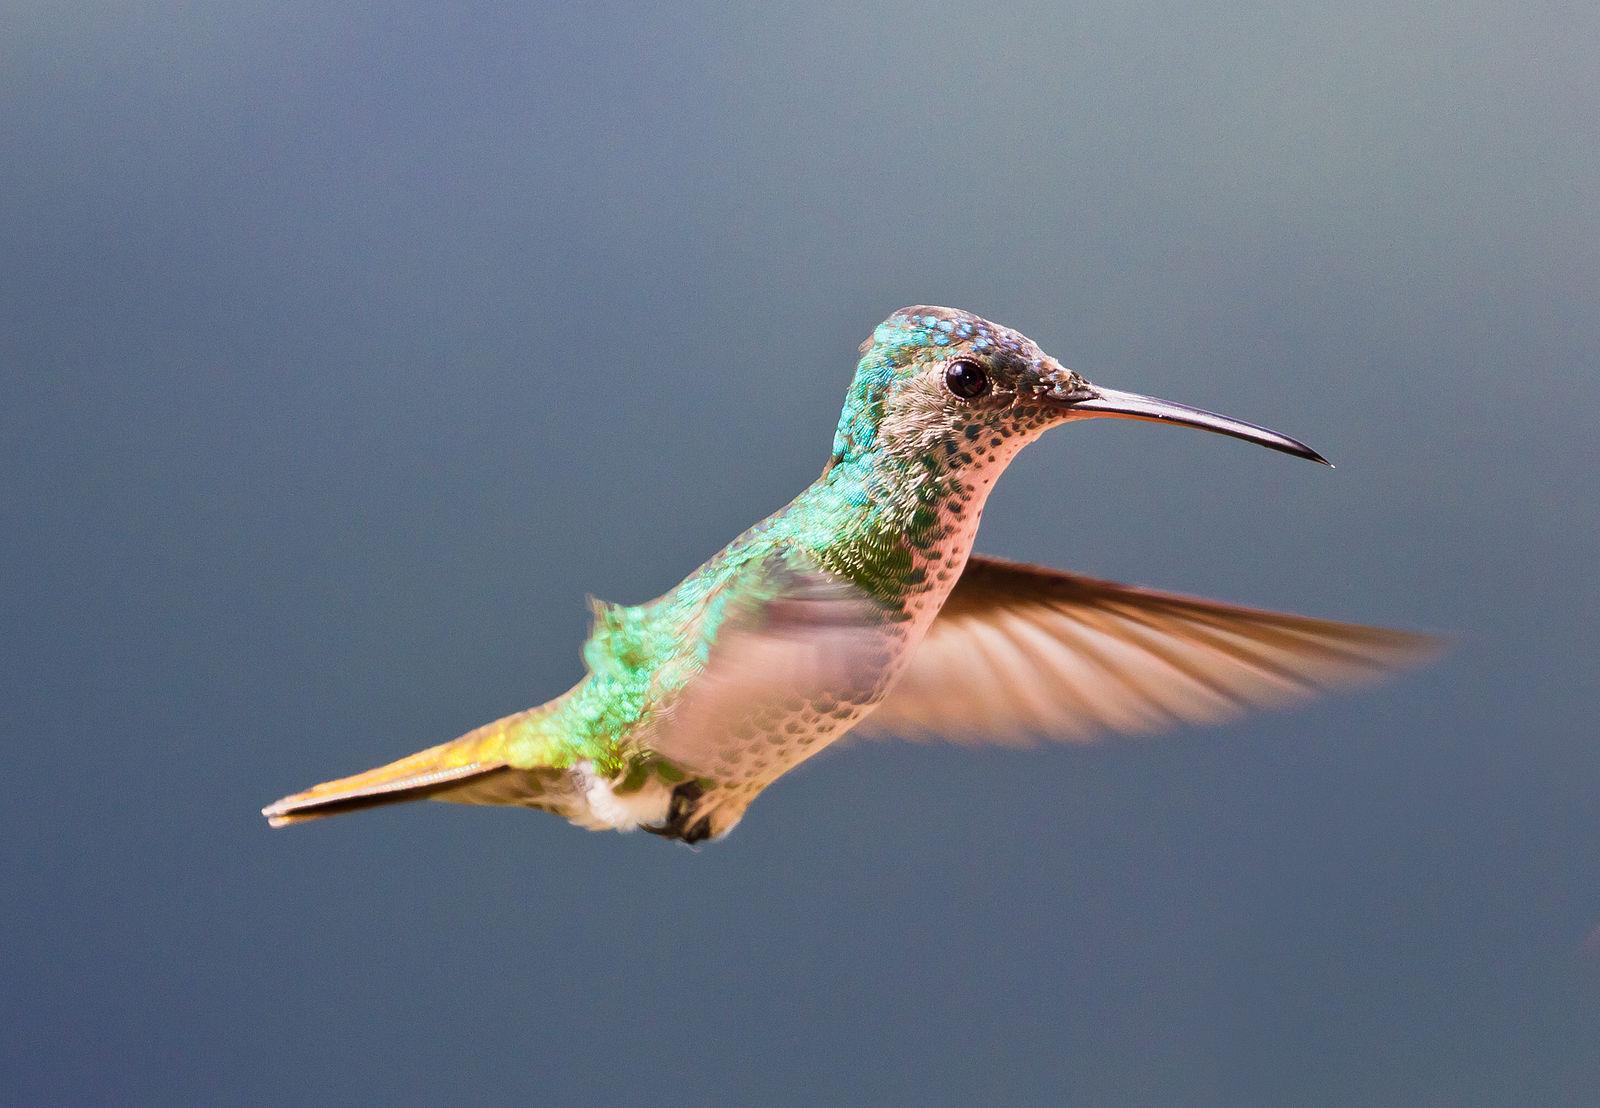 Hummingbird flying - Golden tailed sapphire hummingbird (Chrysuronia oenone), Venezuela. Photo Marcial4, Commons Wikimedia